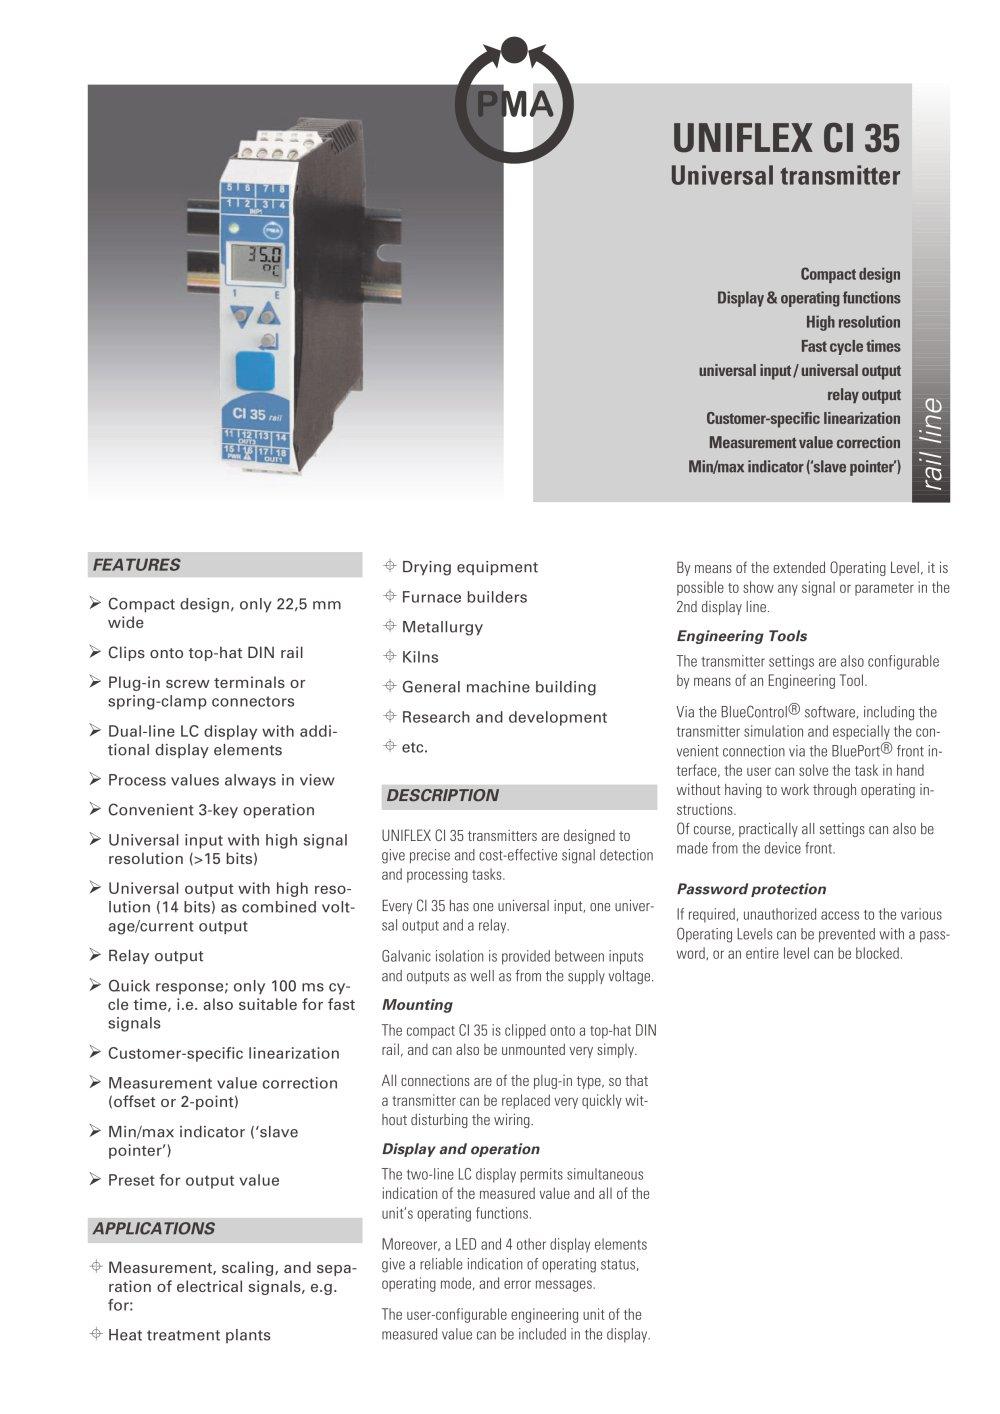 Uniflex specifications